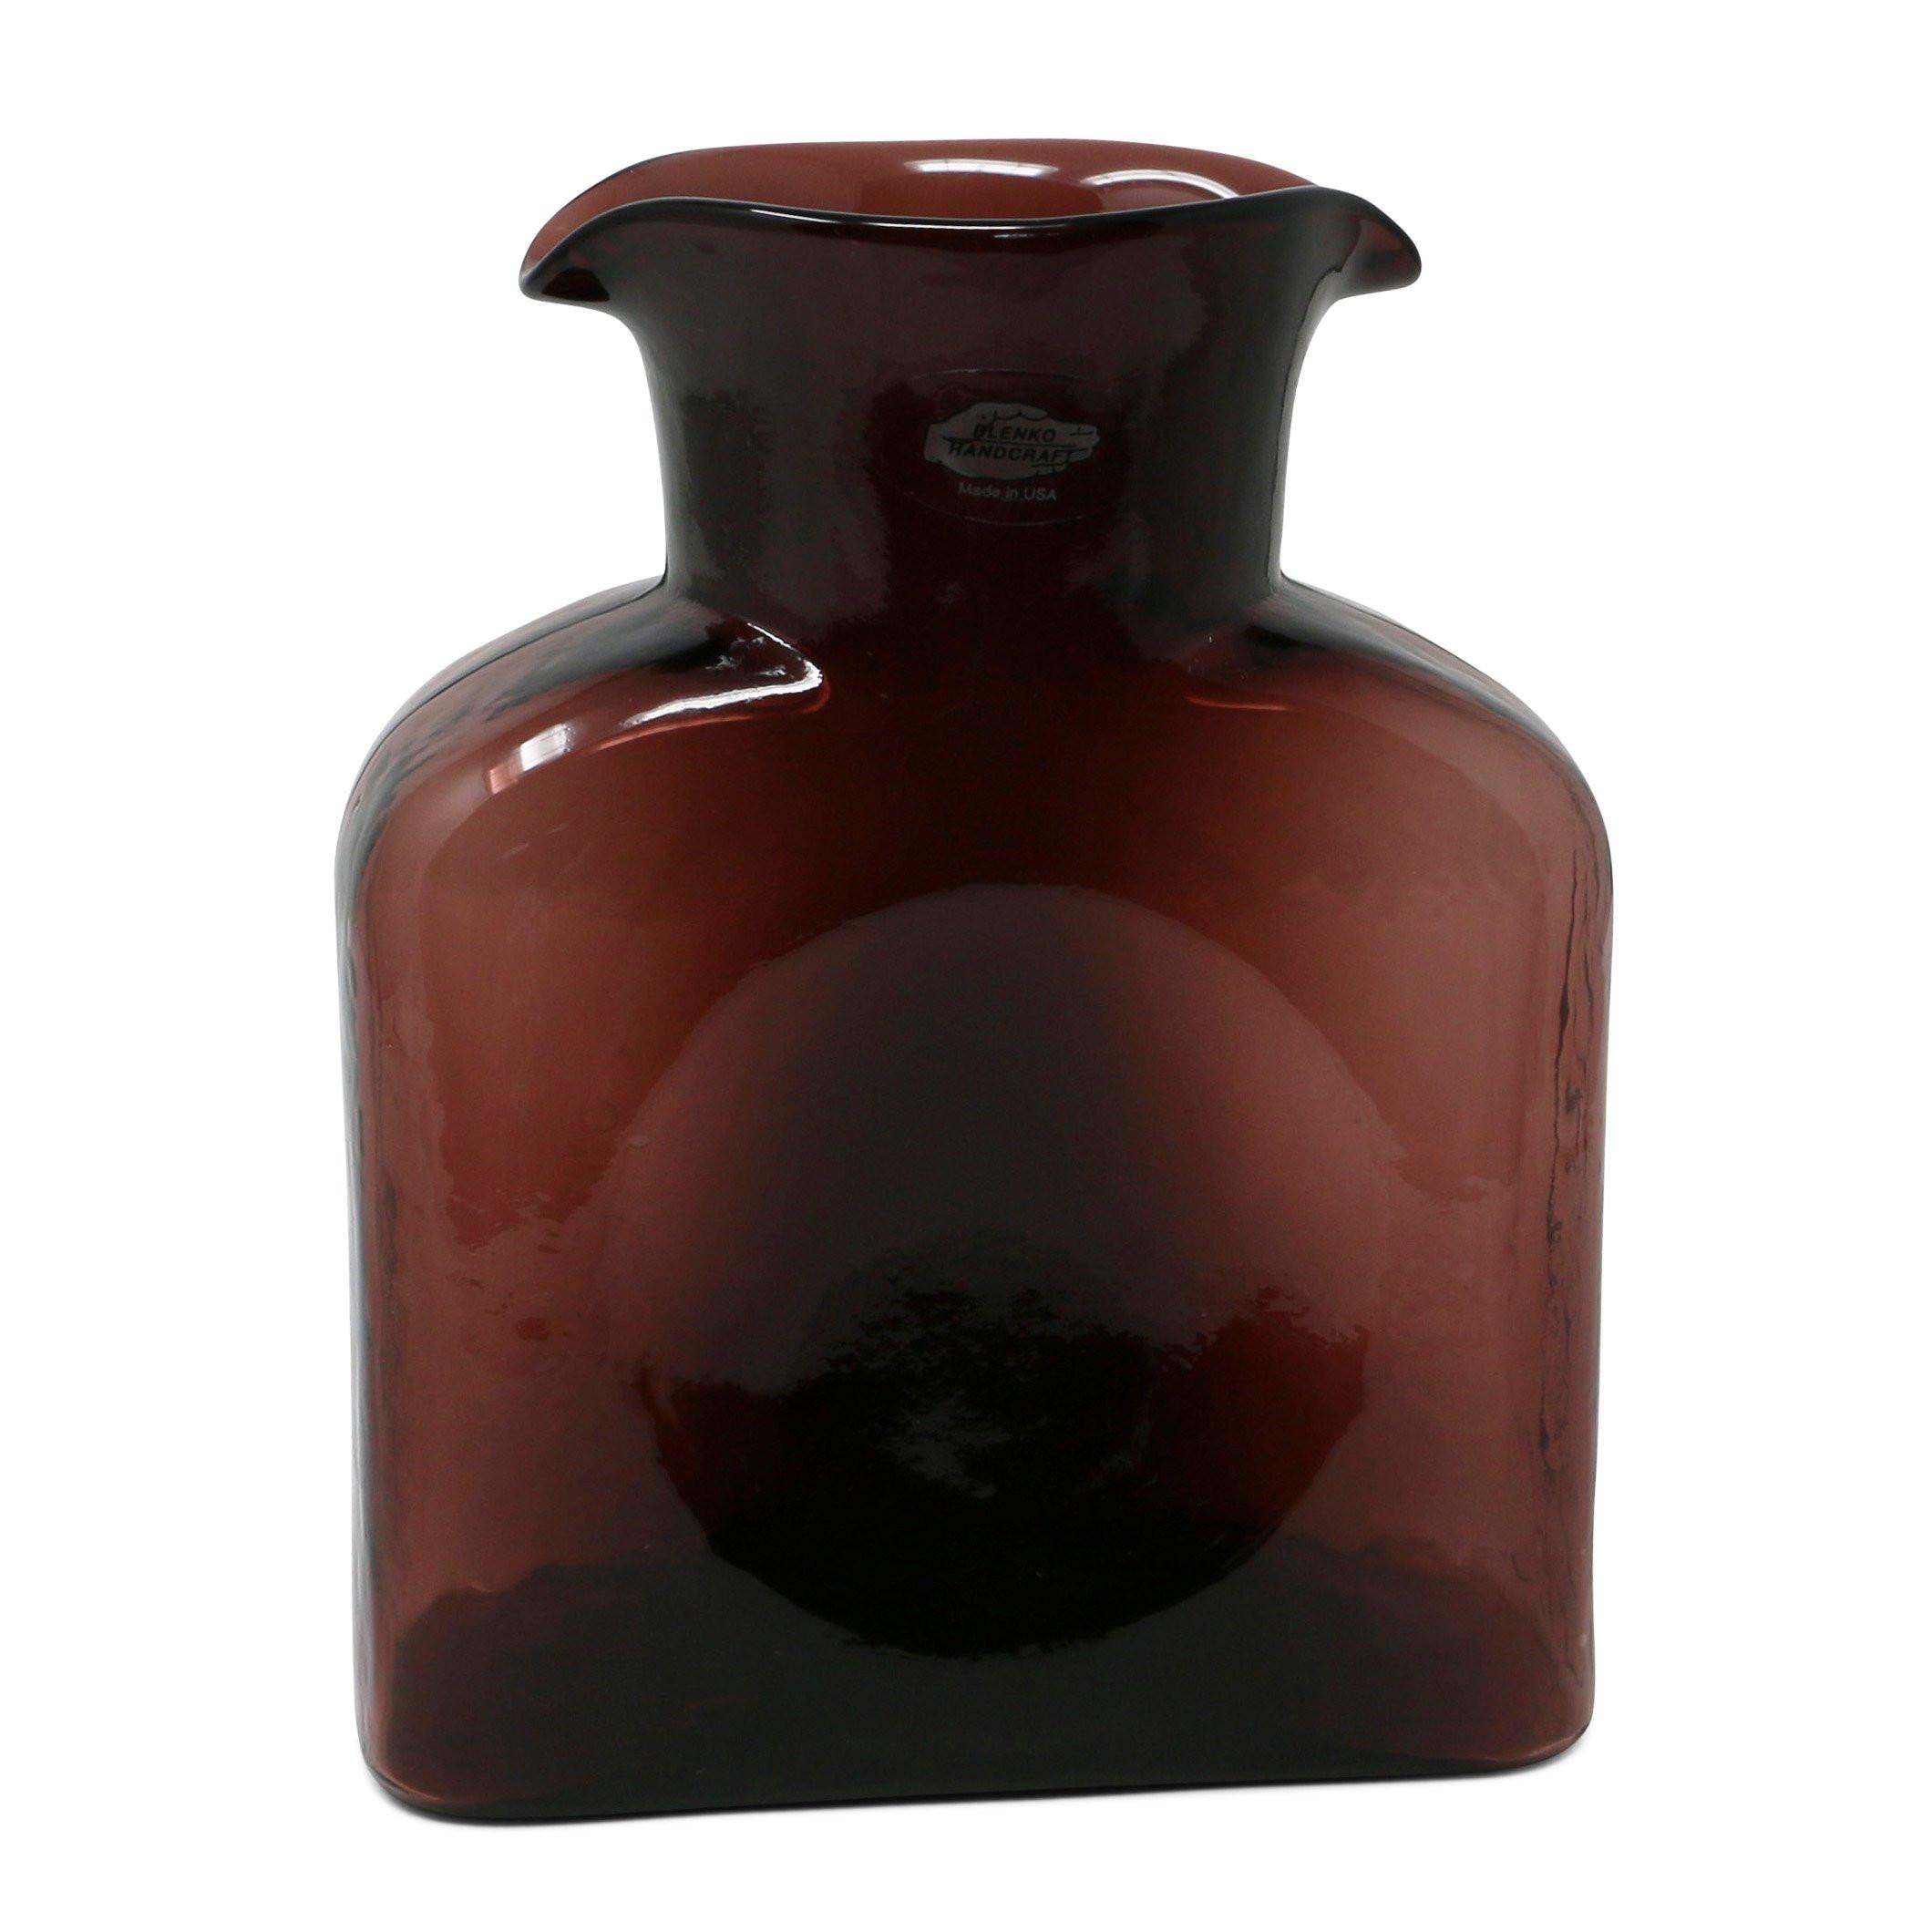 Block Crystal Tulip Vase Of Https Shops Mountvernon org Daily Https Shops Mountvernon org In Amethyst Jpgv1505481624